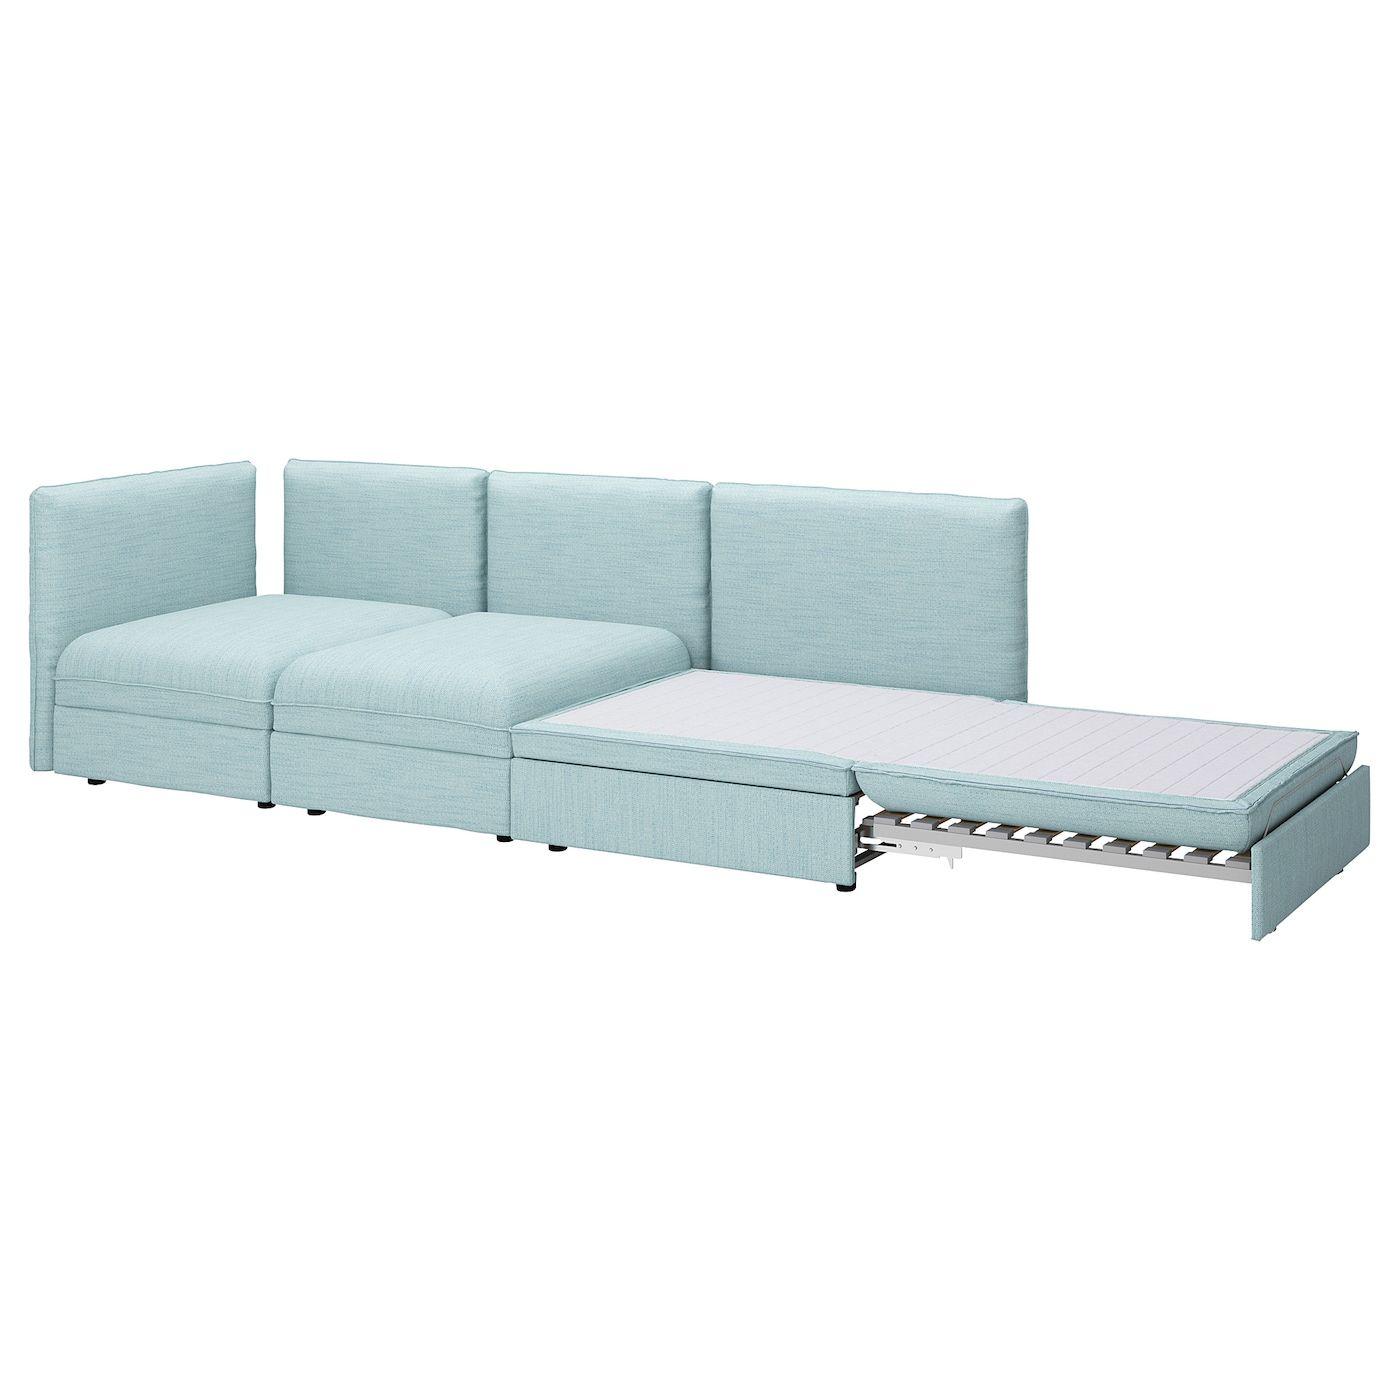 Vallentuna 3 Seat Modular Sleeper Sofa With Open End Hillared Light Blue In 2020 Modular Corner Sofa Modular Sofa Sofa Bed